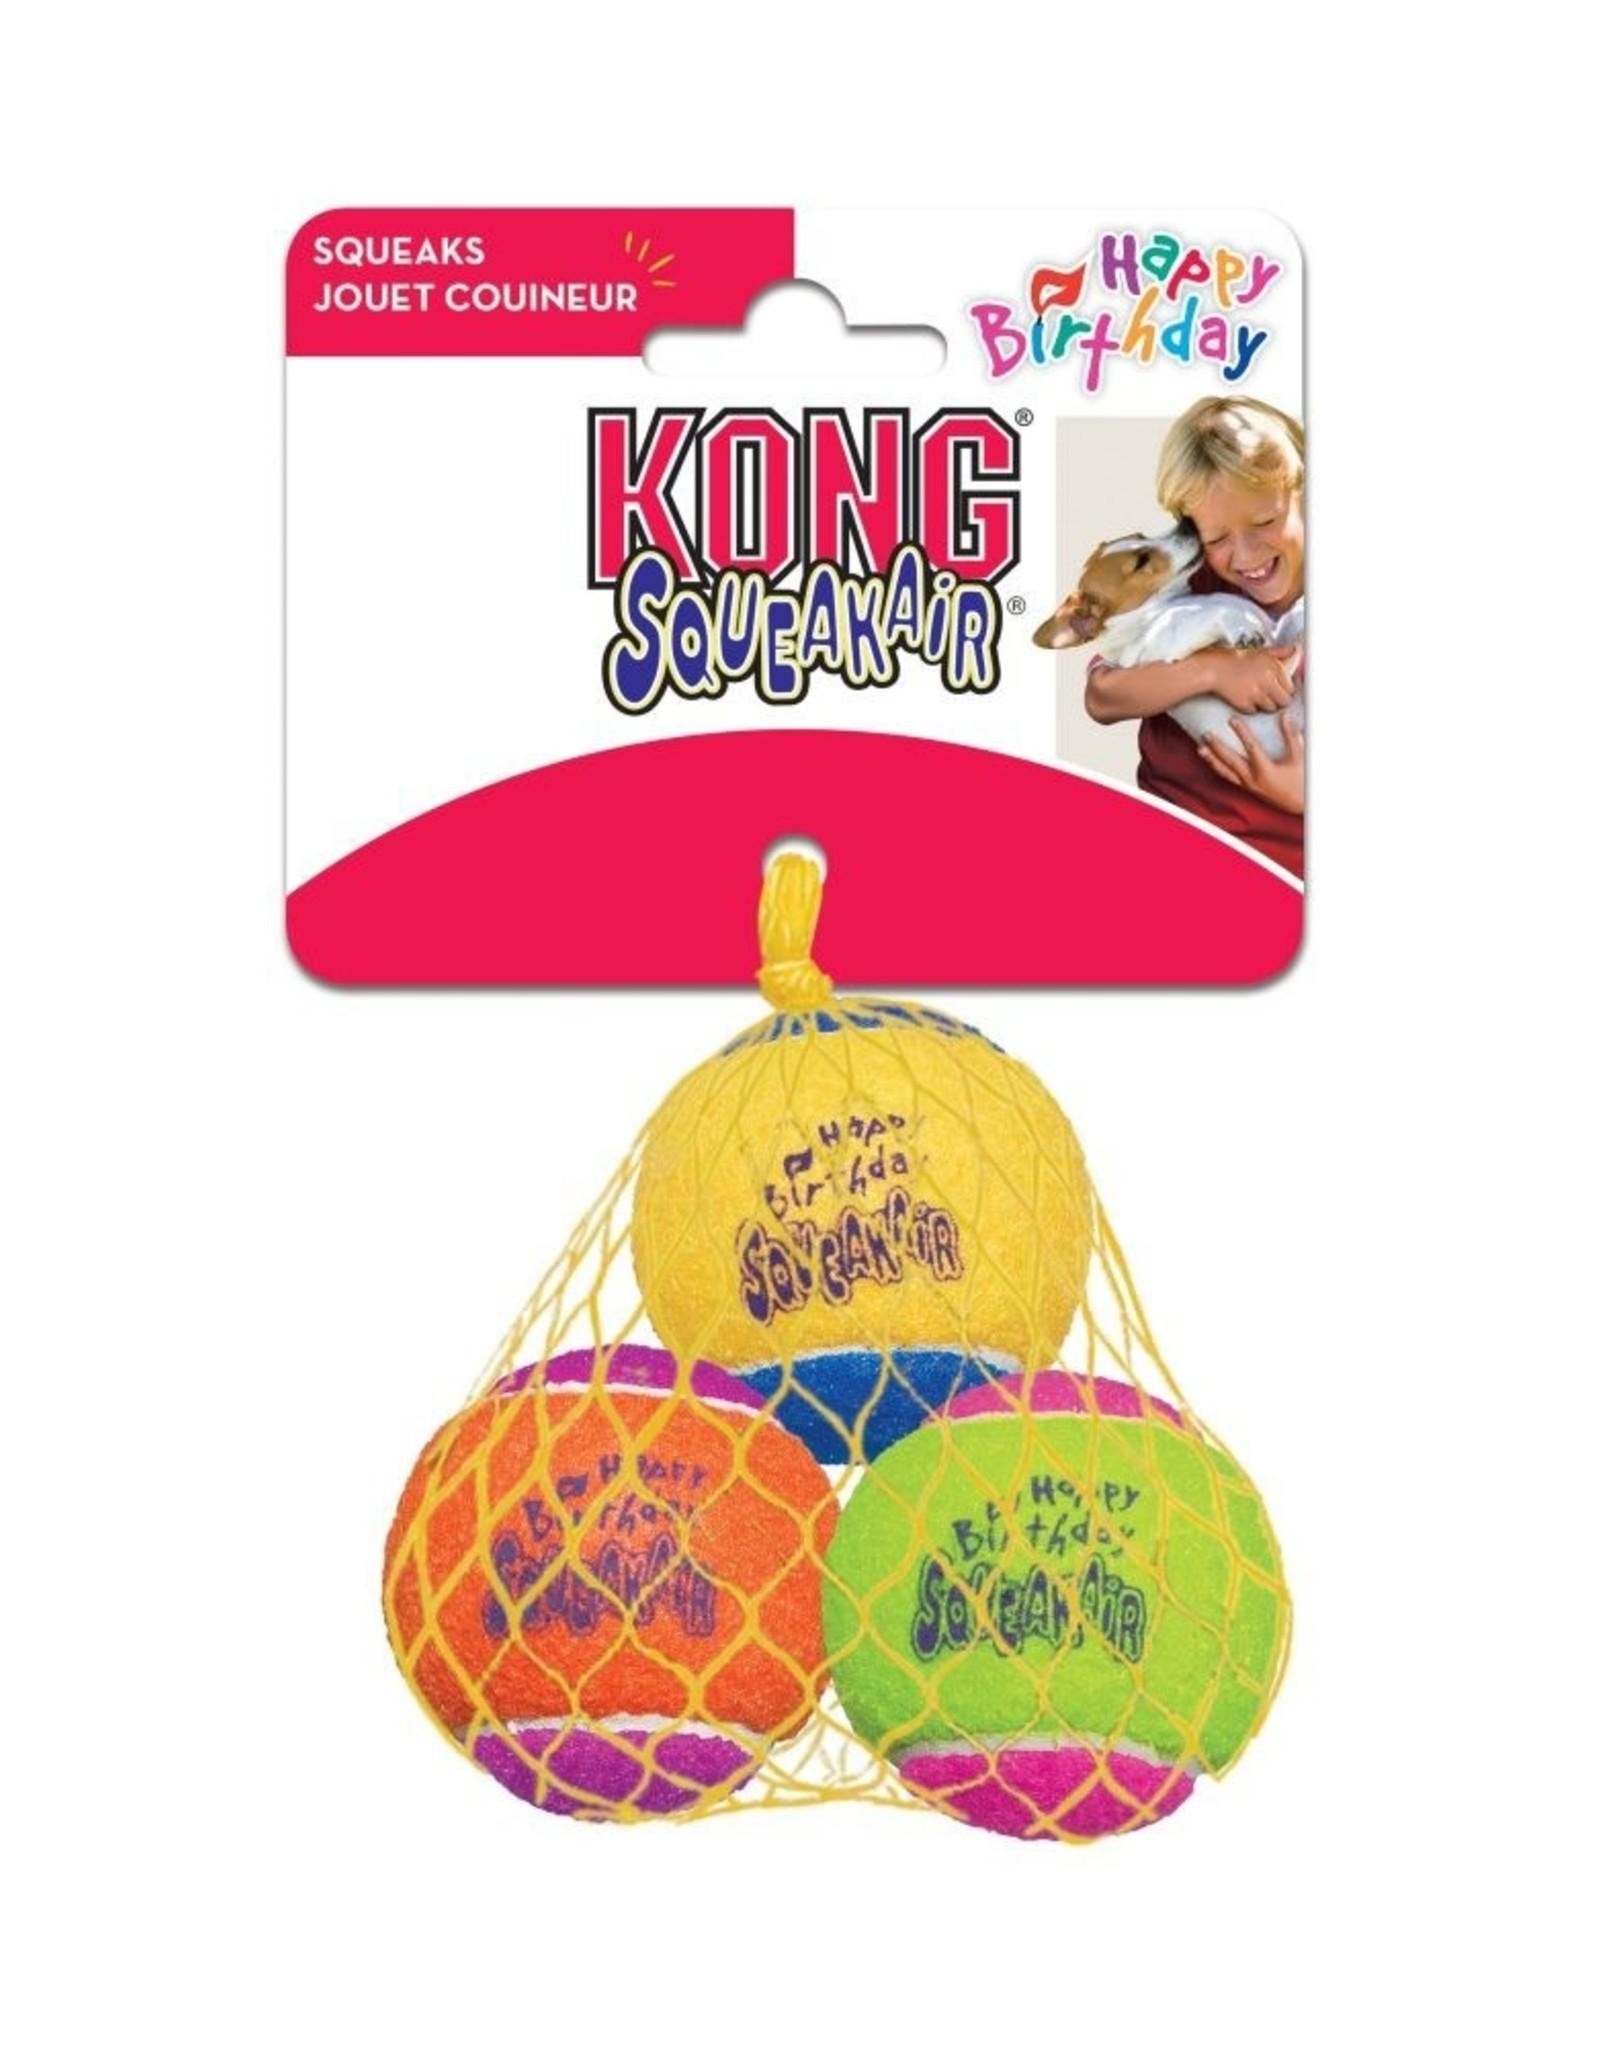 KONG SqueakAir Birthday Balls Dog Toy